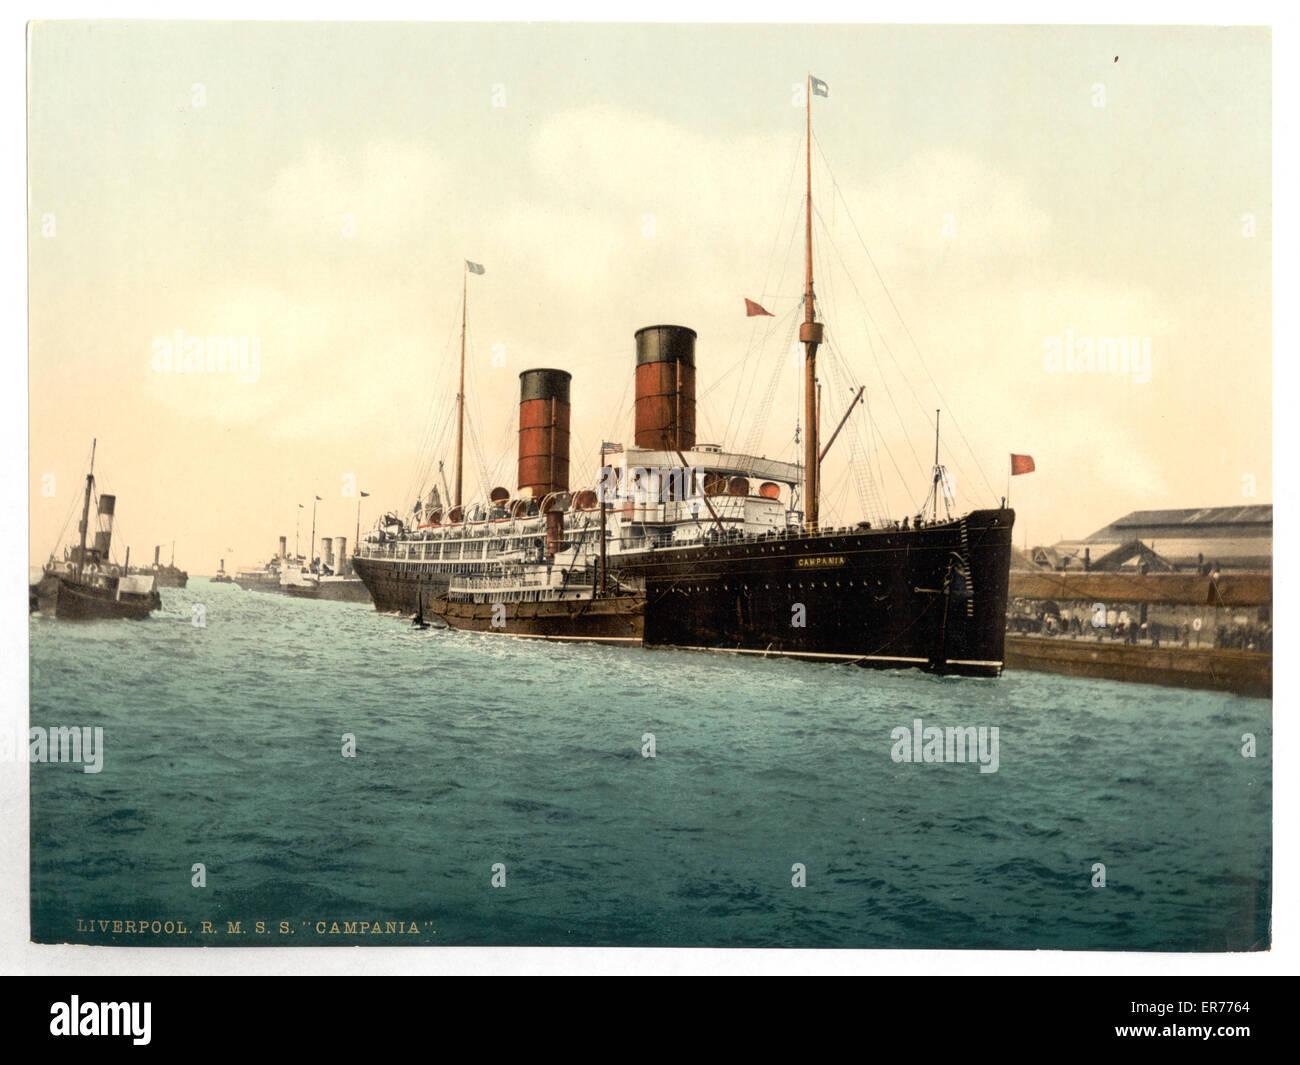 R. M. S. Campania in the Mersey. Date between ca. 1890 and ca. 1900. R. M. S. Campania in the Mersey. Date between - Stock Image